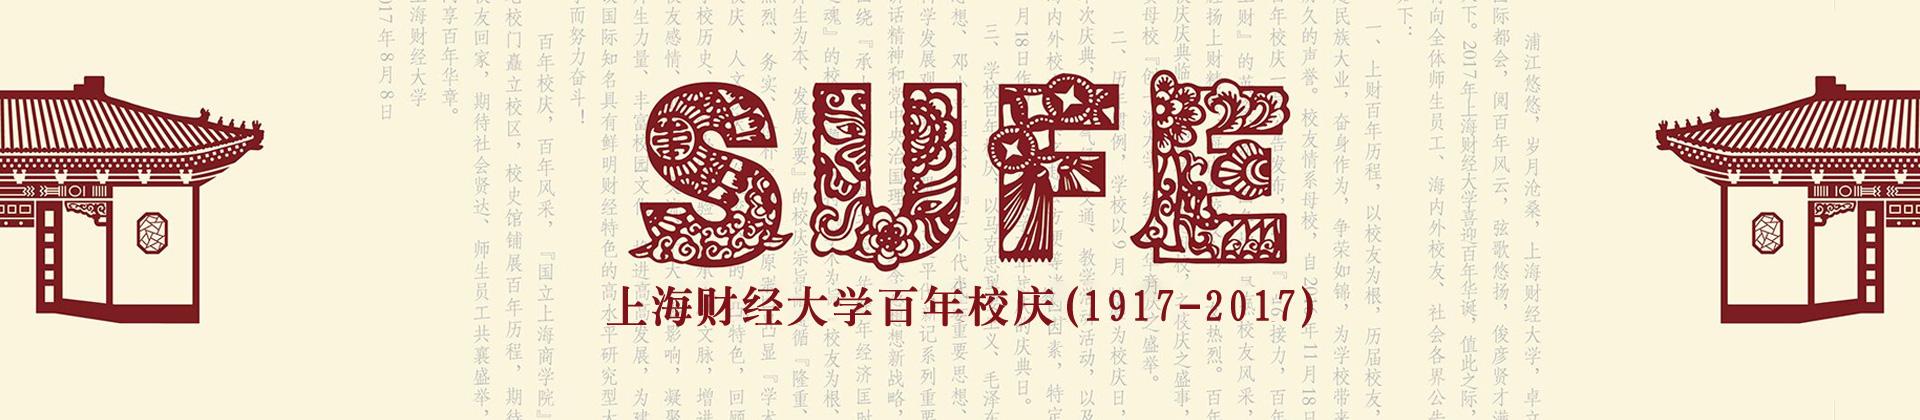 百年校庆banner.jpg